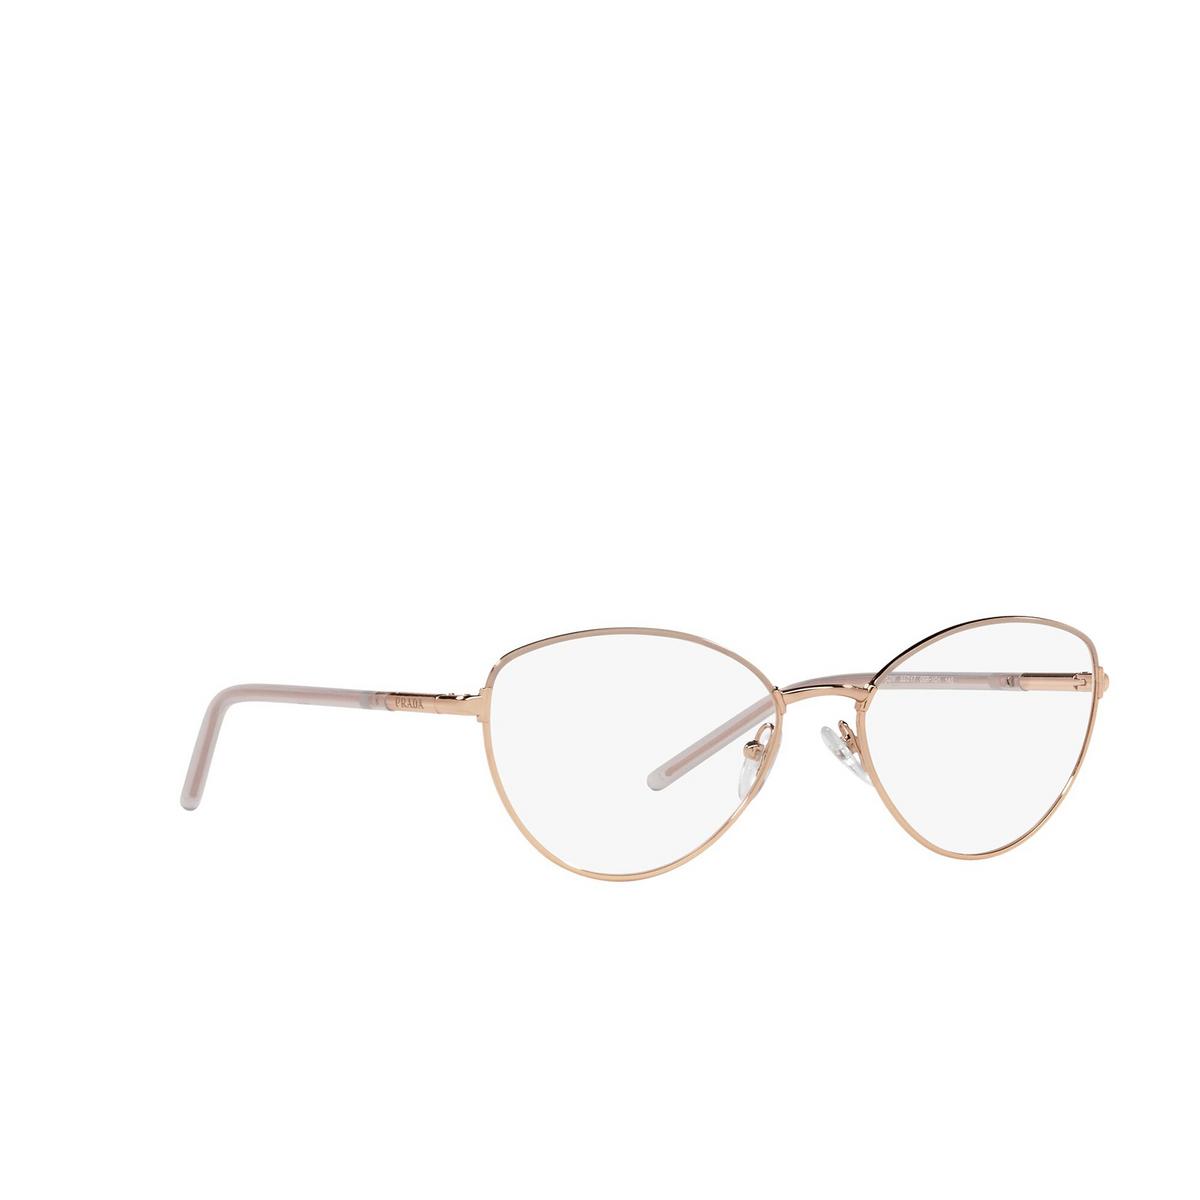 Prada® Butterfly Eyeglasses: PR 62WV color Powder / Pink Gold 05R1O1 - three-quarters view.